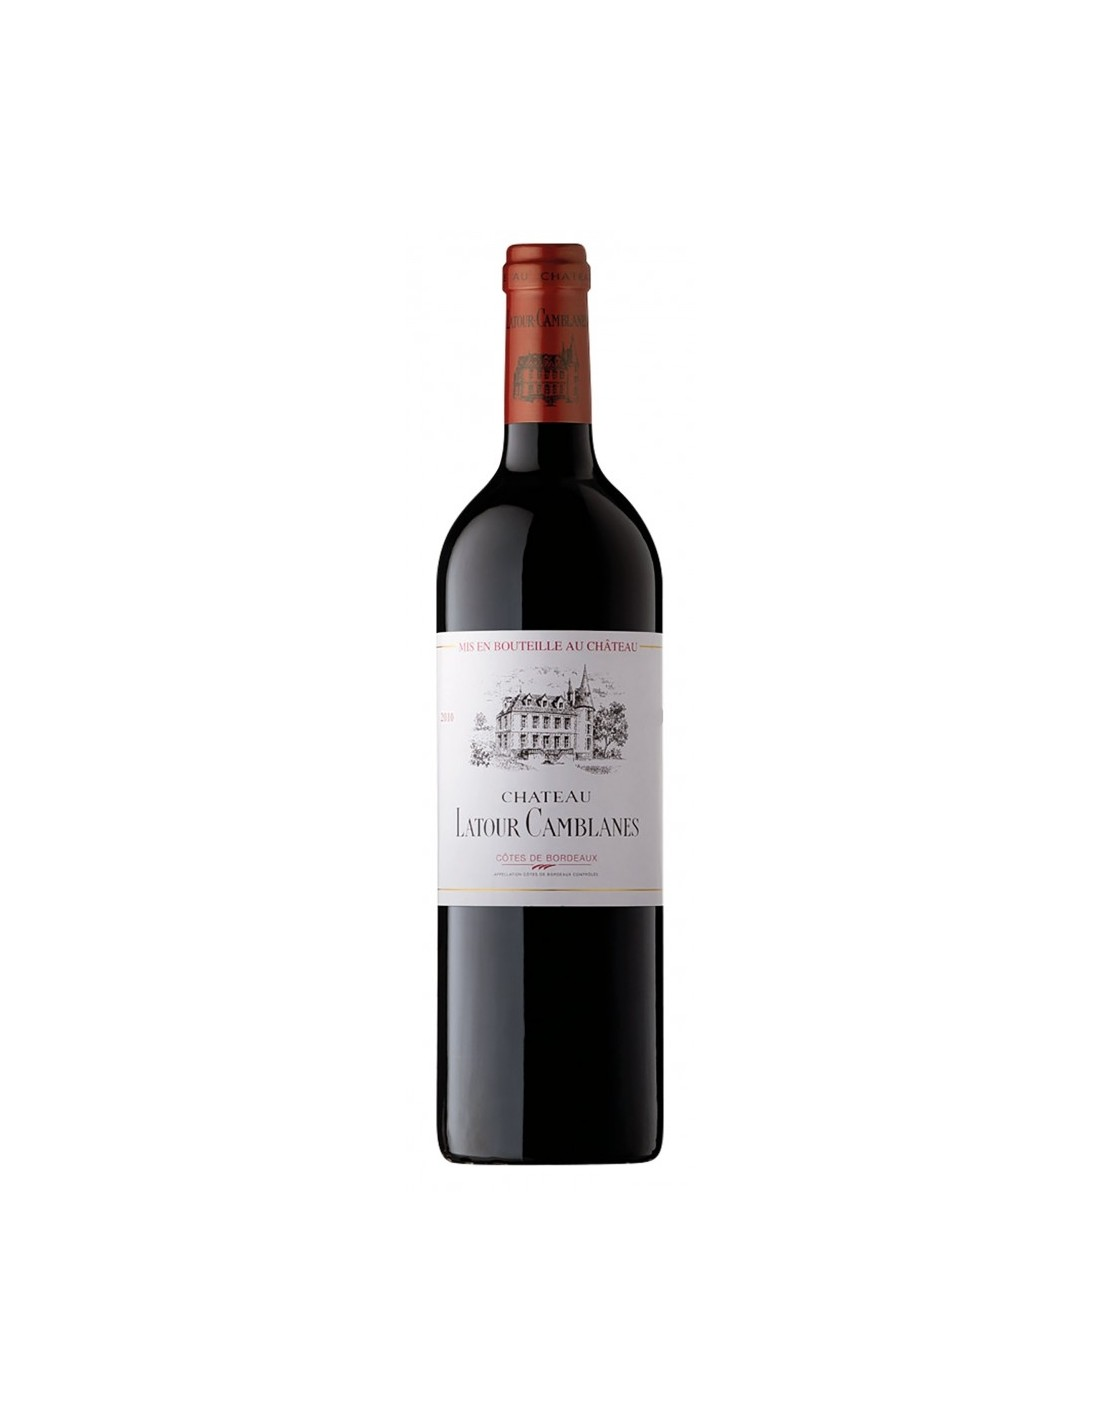 Vin rosu, Cupaj, Château Latour Camblanes Bordeaux, 0.75L, 13% alc., Franta